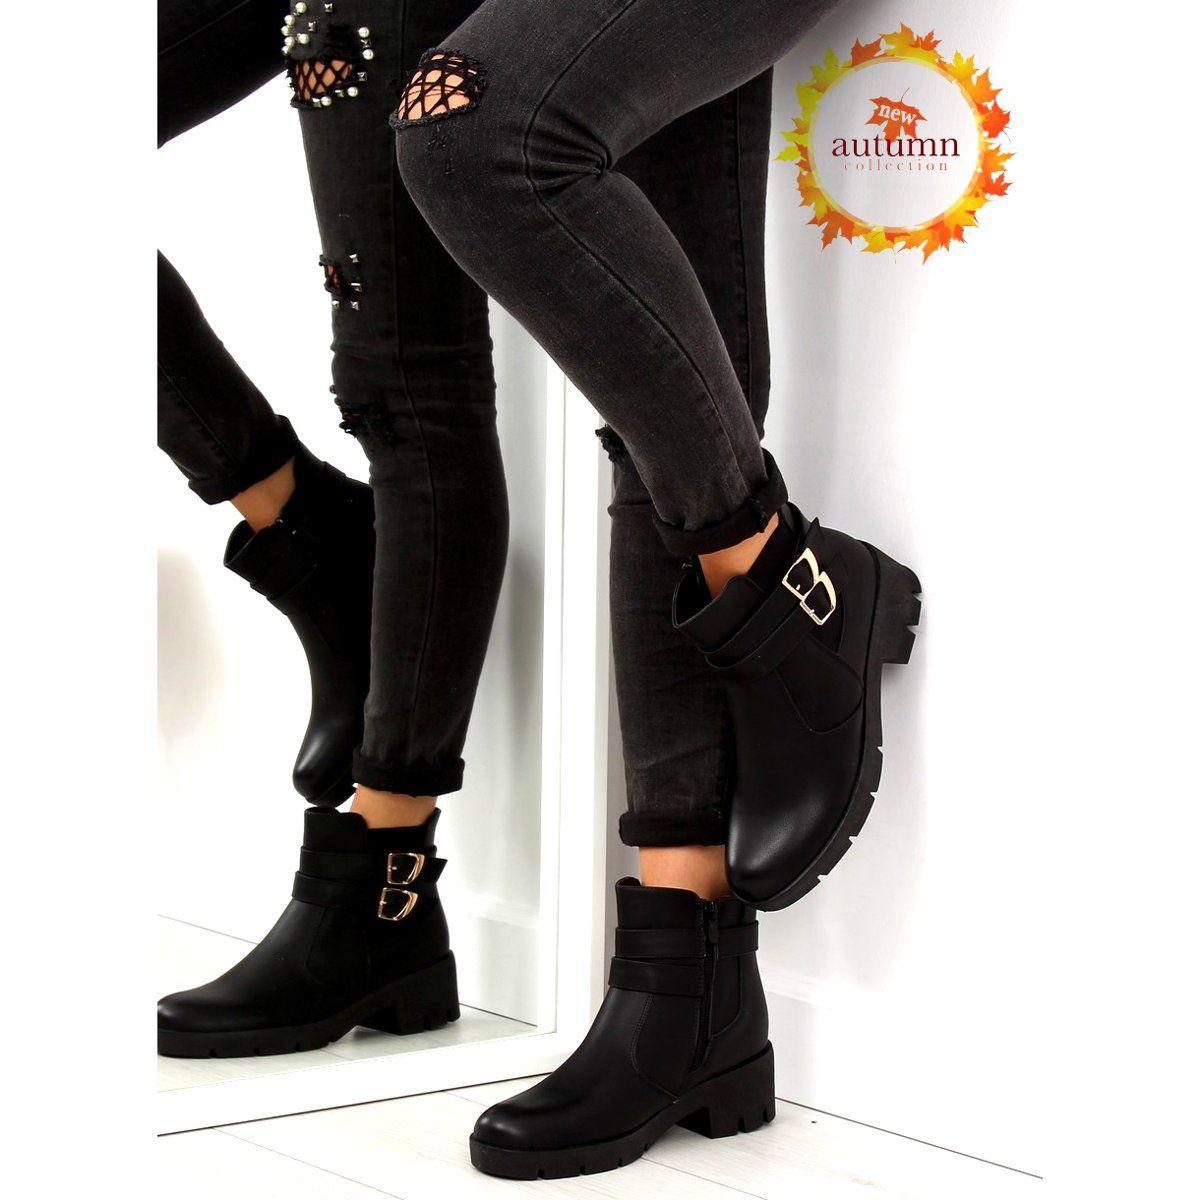 Botki Na Grubej Podeszwie Czarne Hy 54 Black Fashion Biker Boot Shoes